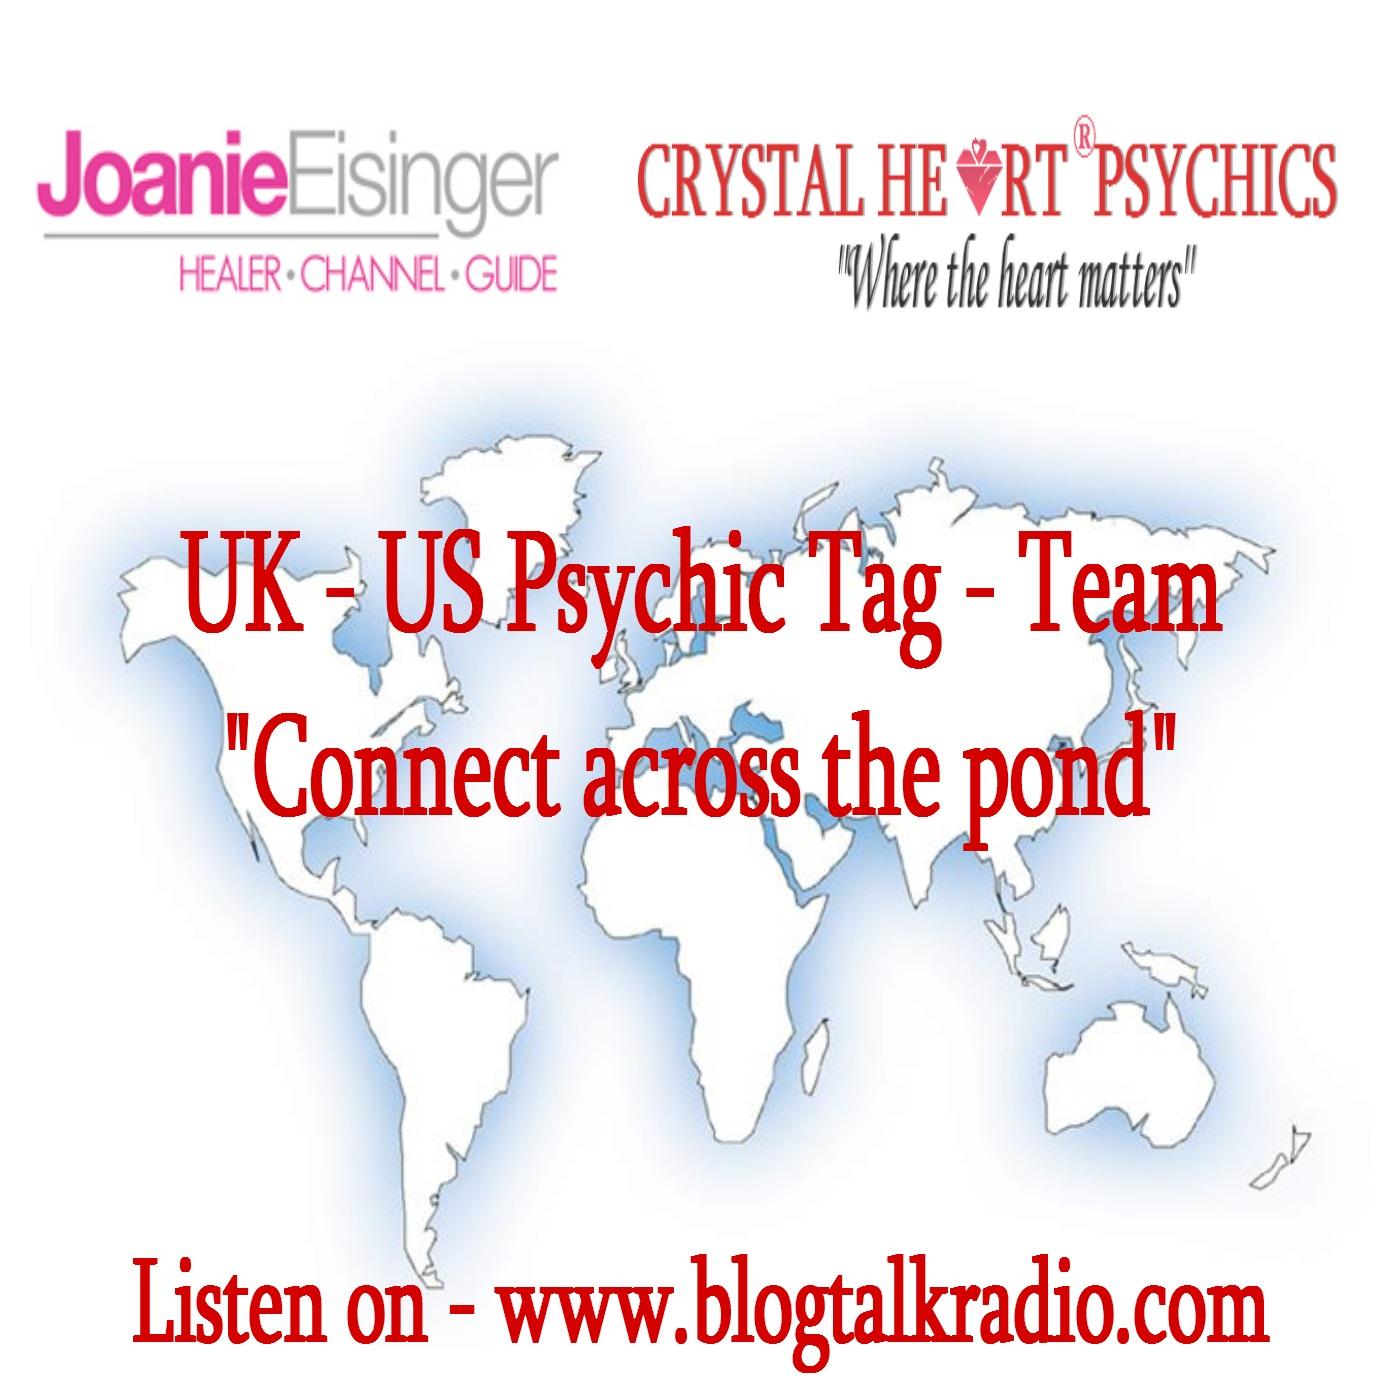 http://www.crystalheartpsychics.com/wp-content/uploads/2016/09/Blog-1400.1400-8.jpg